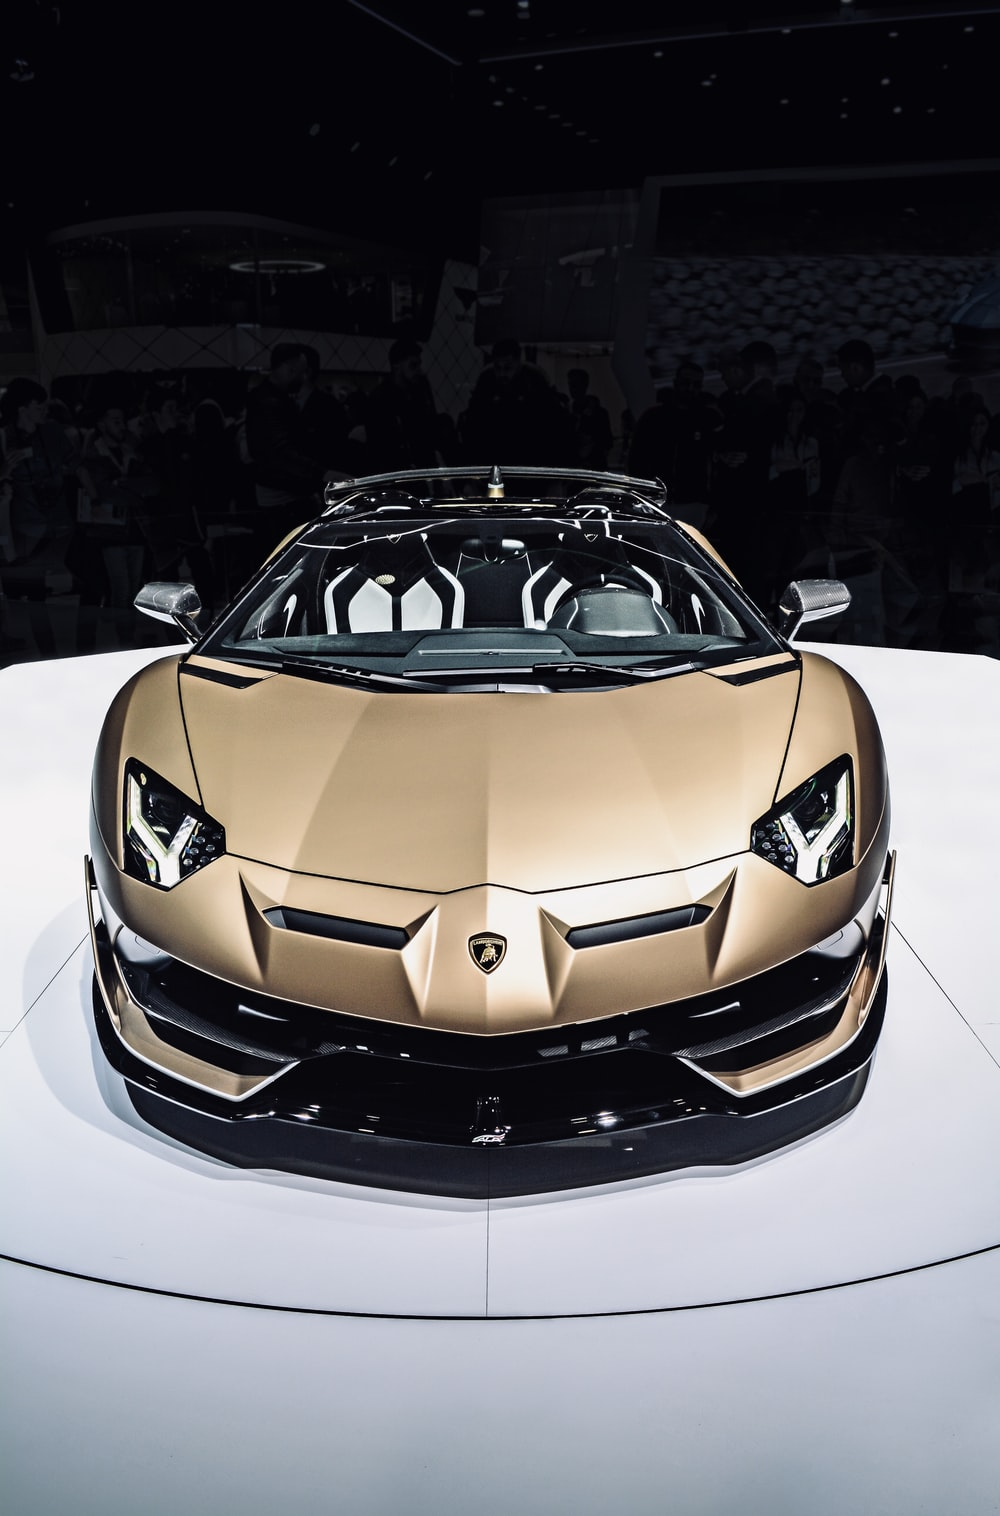 brown Lamborghini sports car